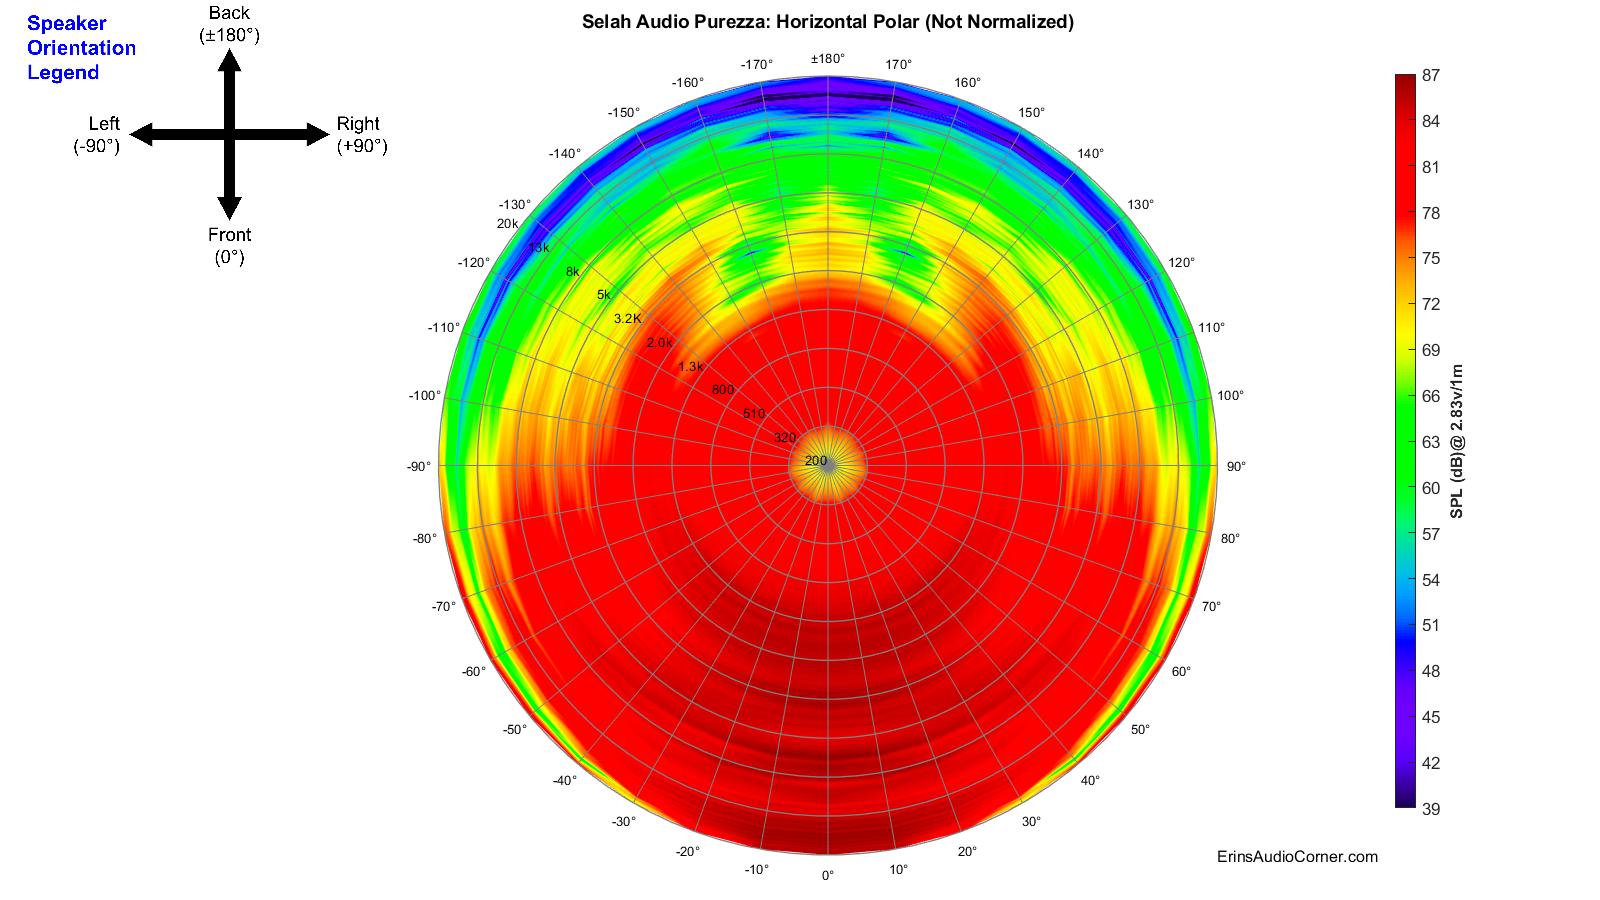 Selah%20Audio%20Purezza_360_Horizontal_Polar.png